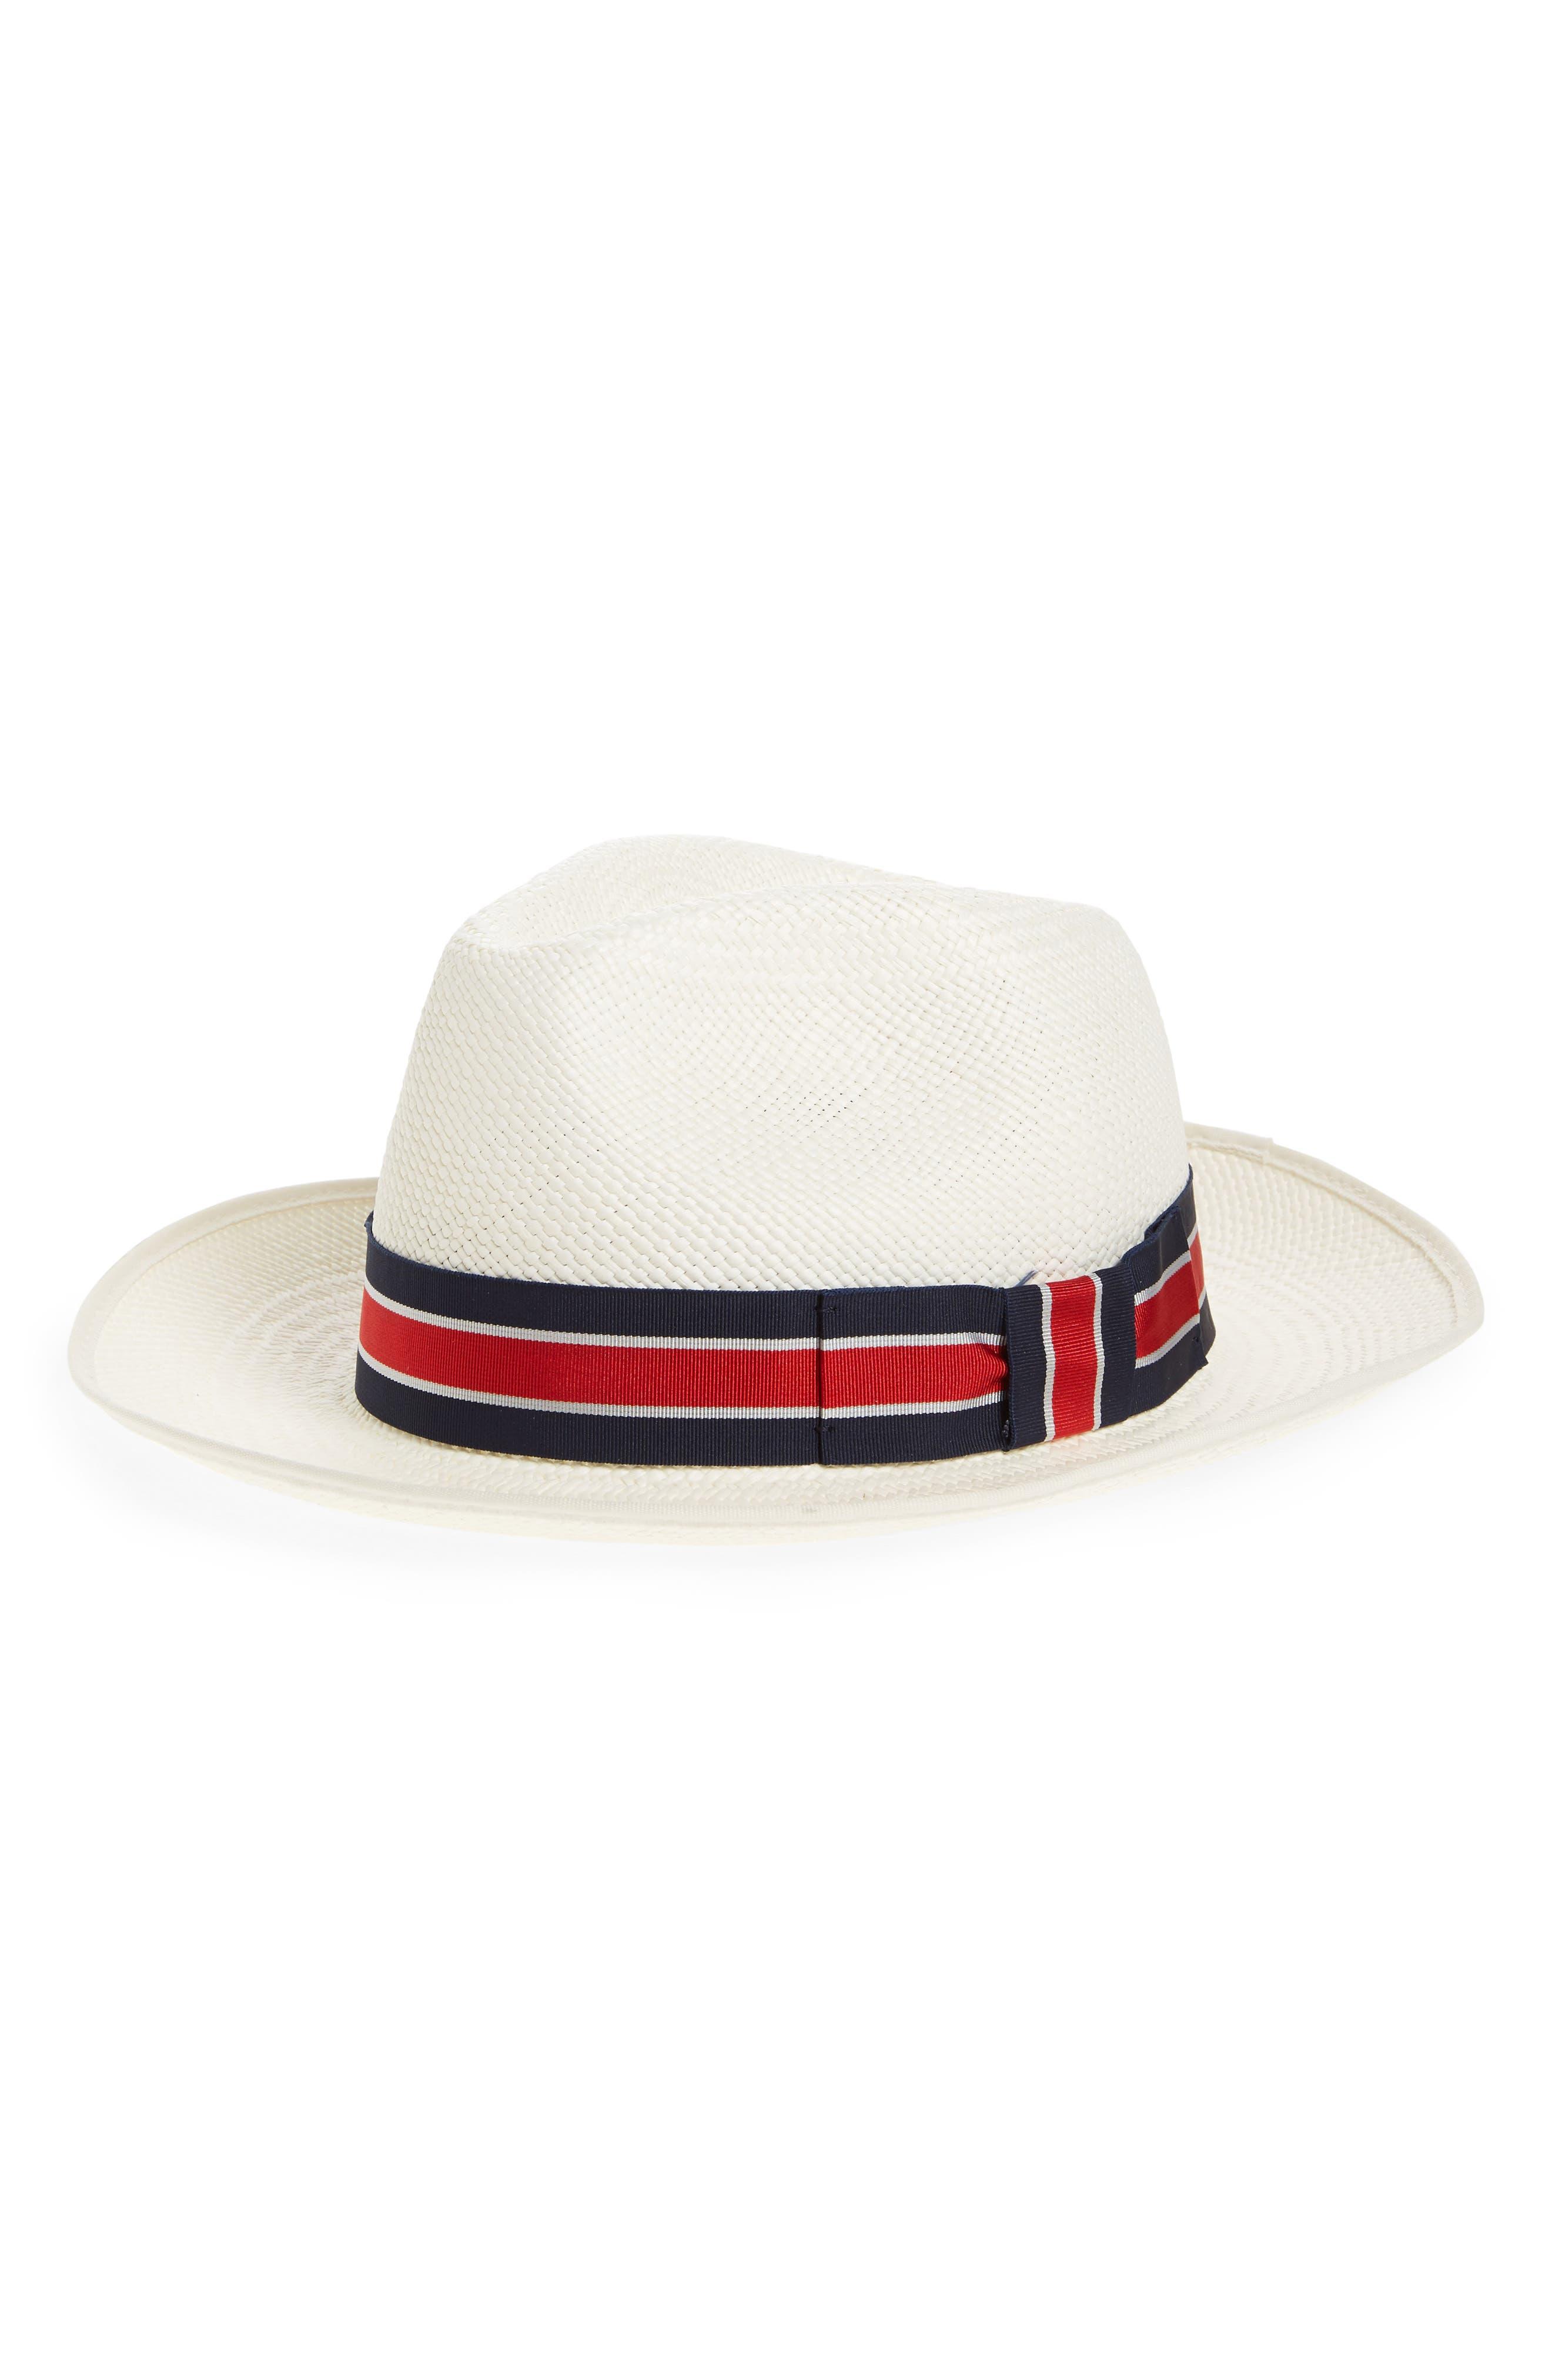 Christy's Preset Panama Hat